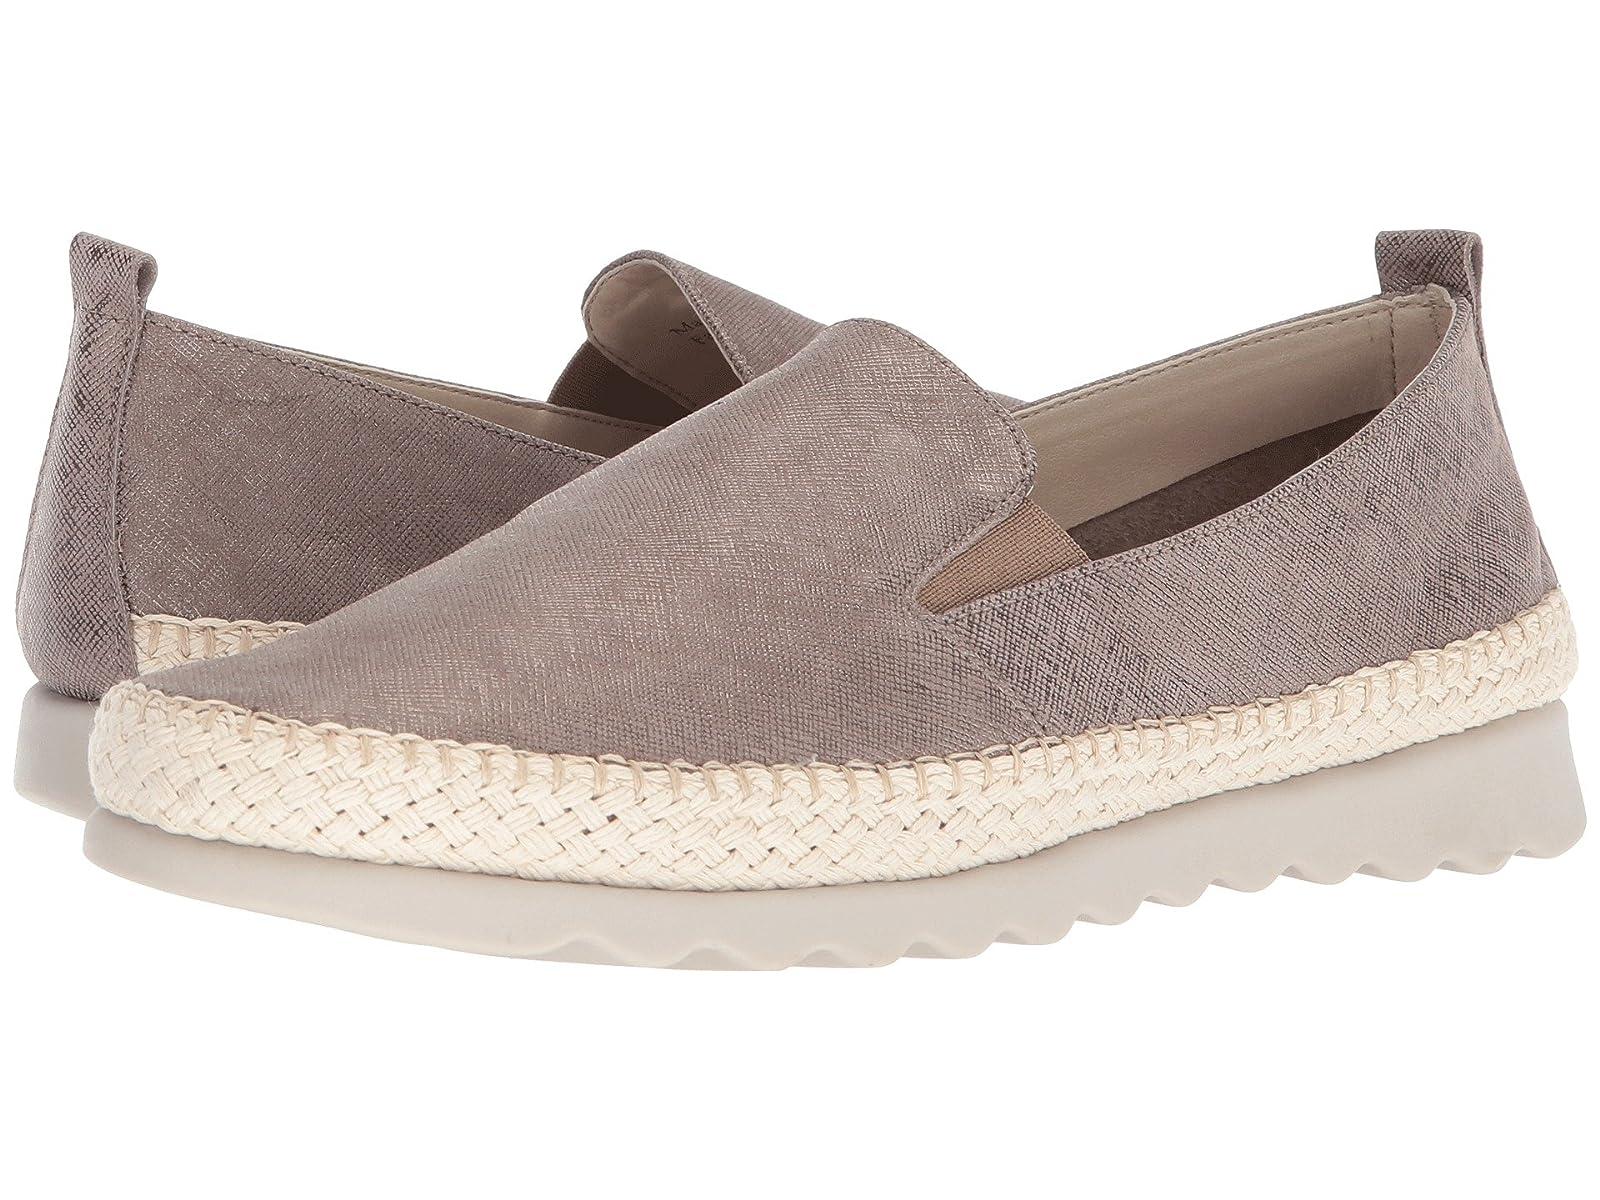 The FLEXX ChappieAtmospheric grades have affordable shoes